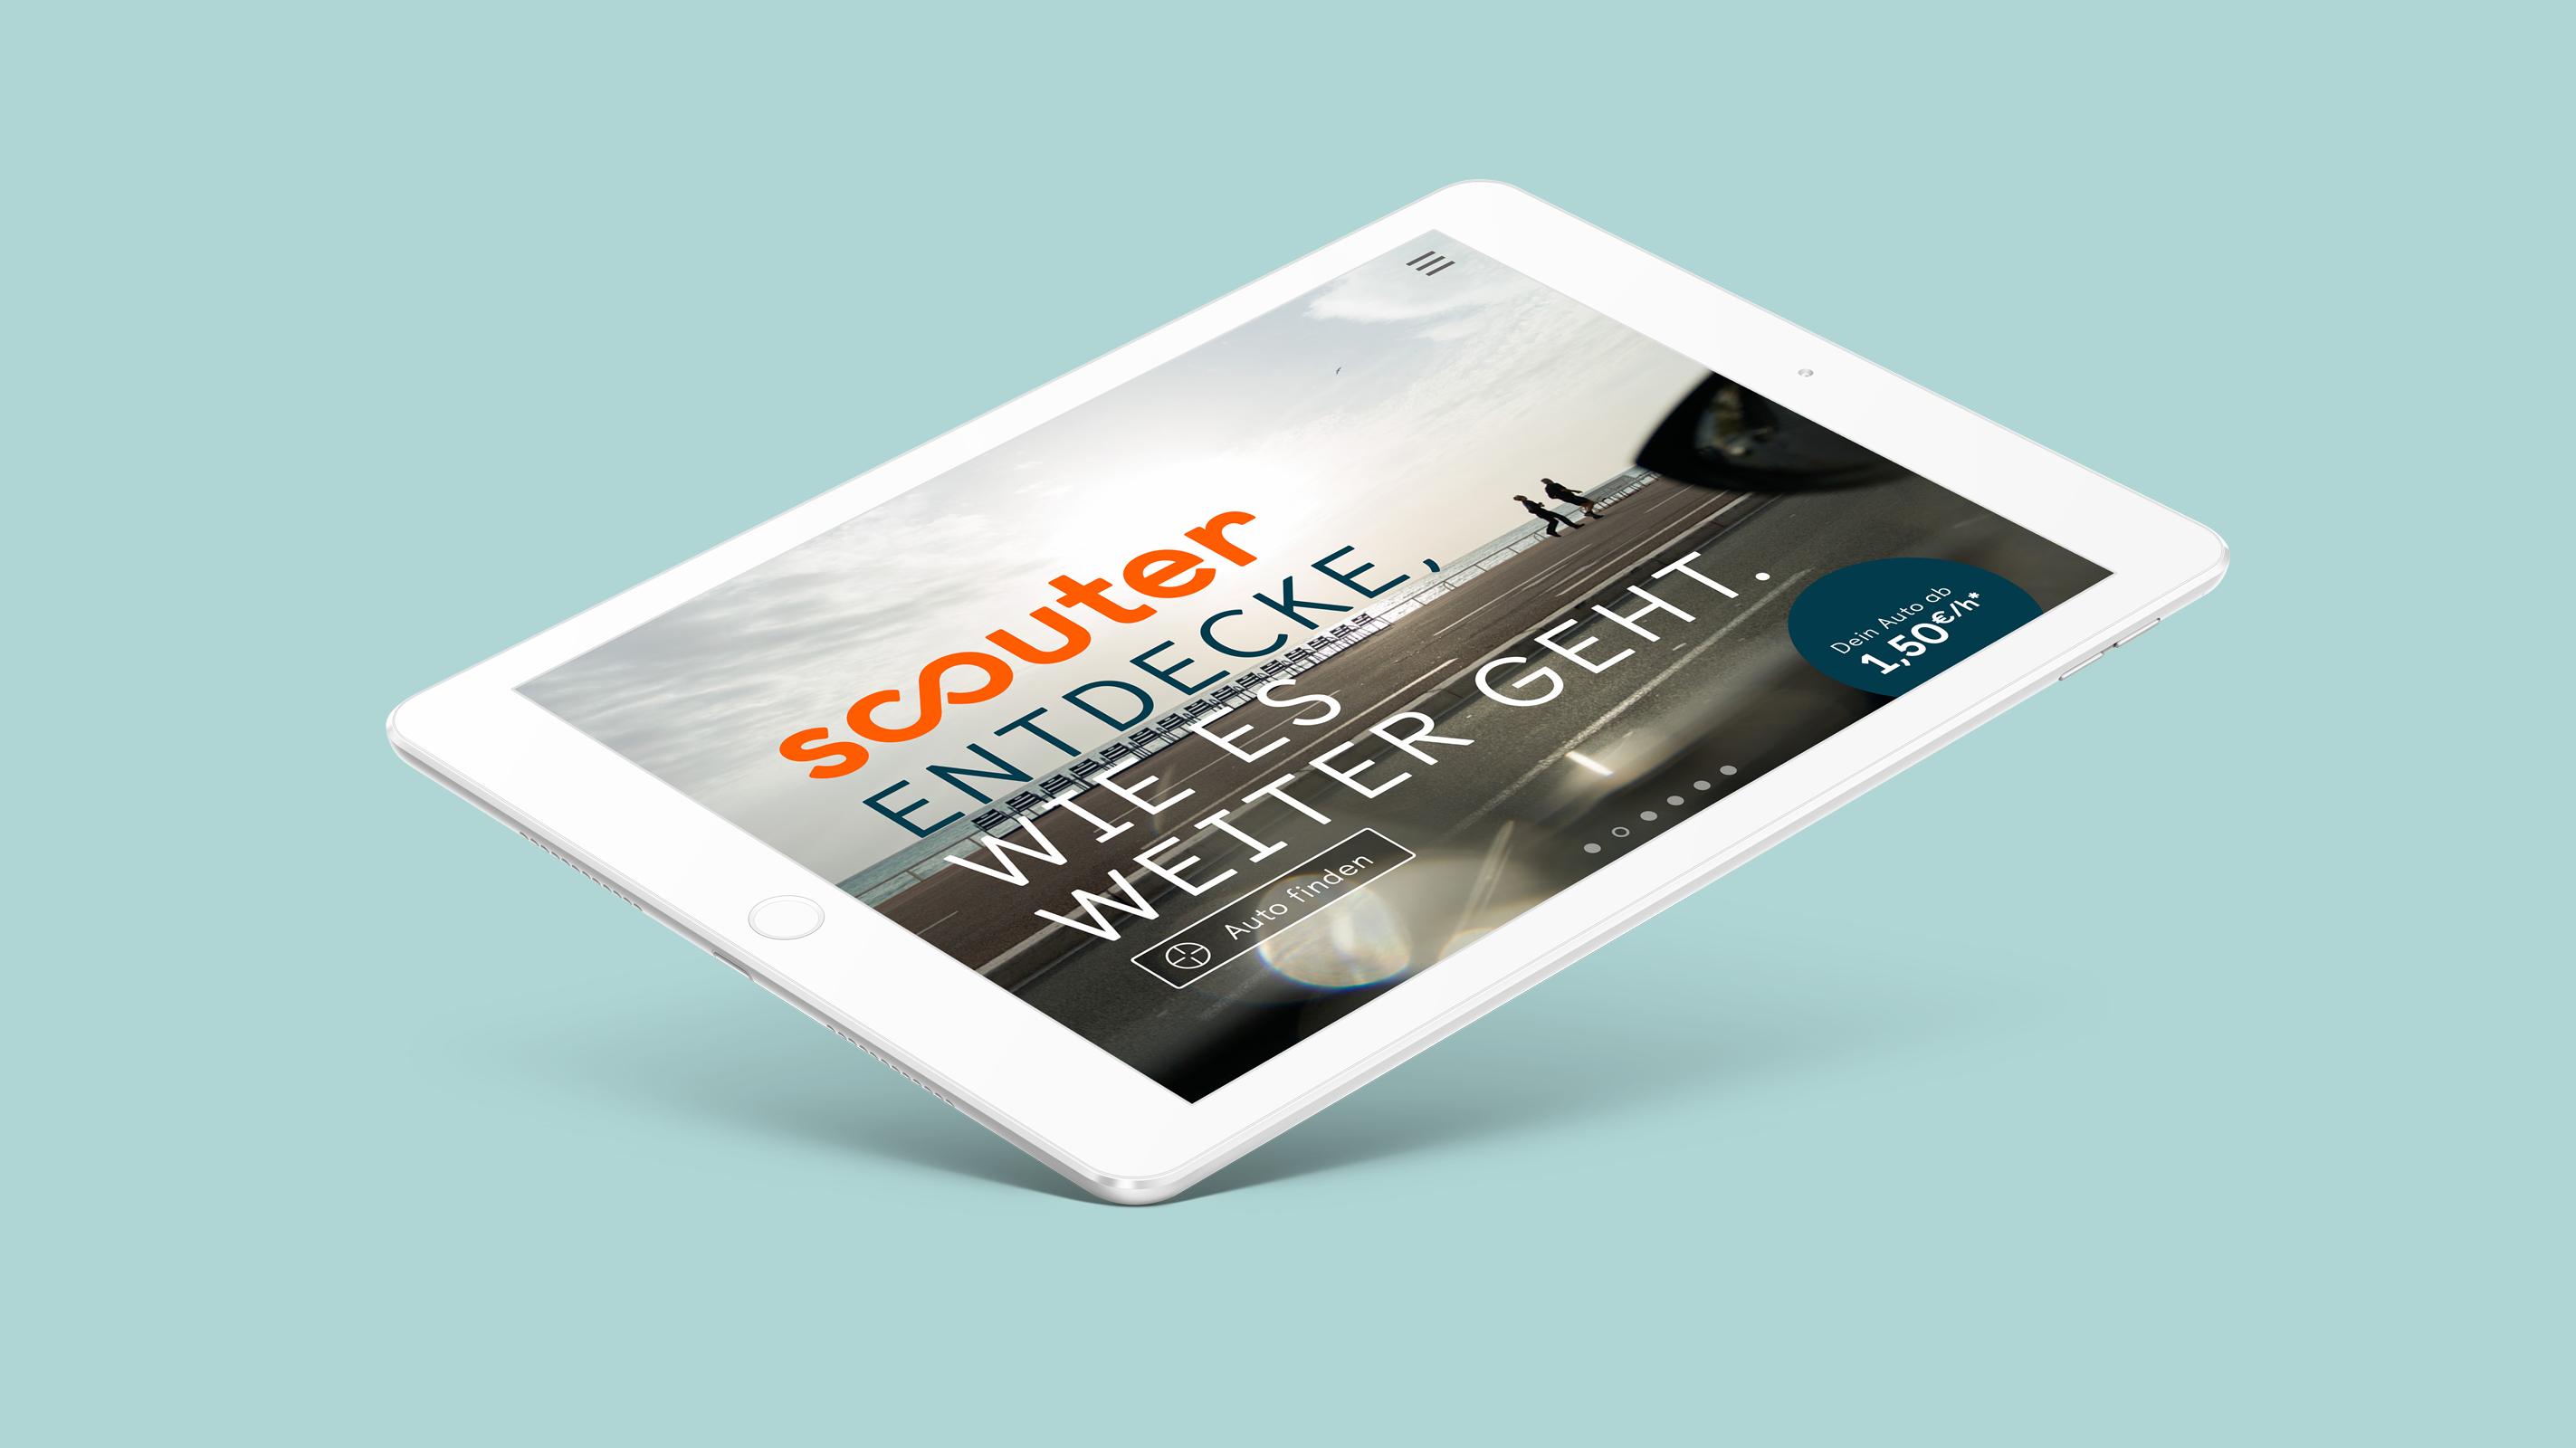 Scouter Carsharing – Poarangan Brand Design5